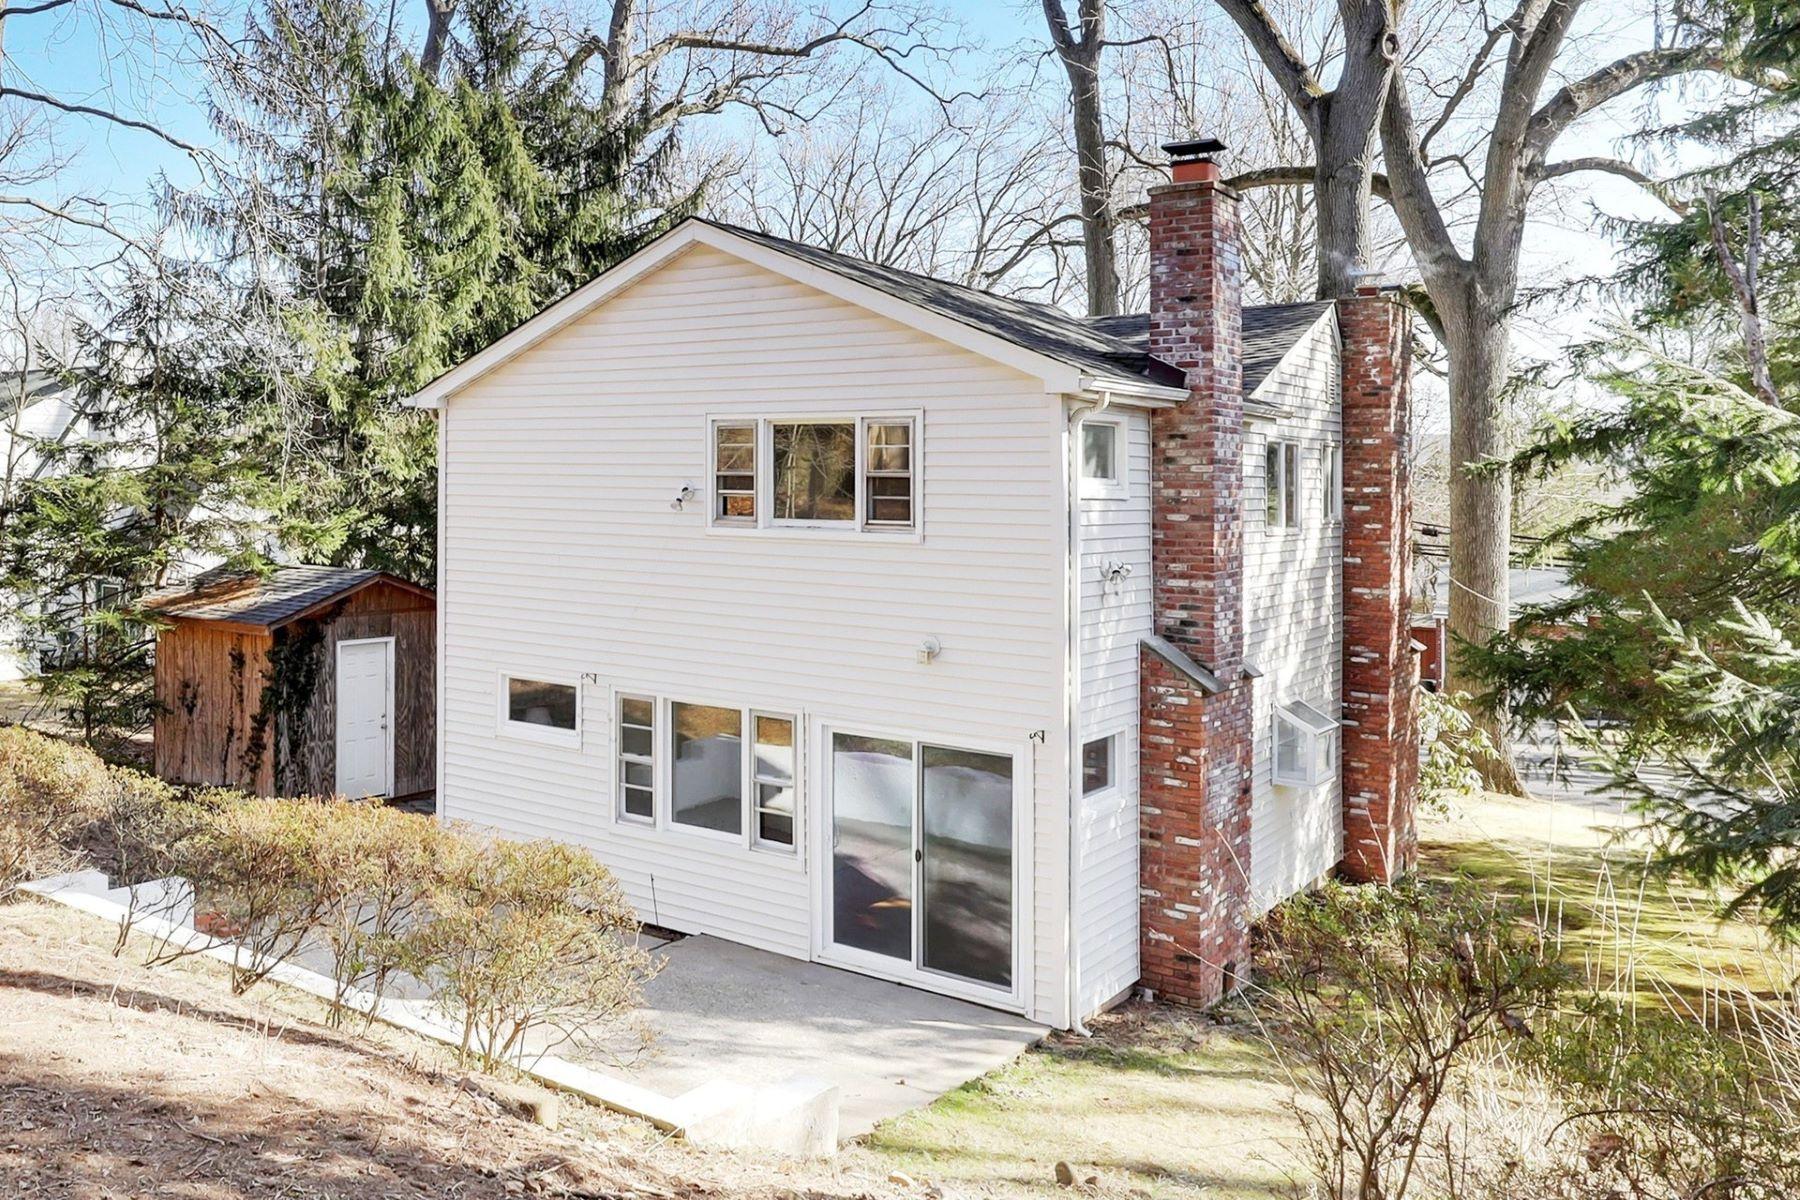 Property 为 销售 在 Welcome Home! 339 Jefferson Ave, Cresskill, 新泽西州 07626 美国